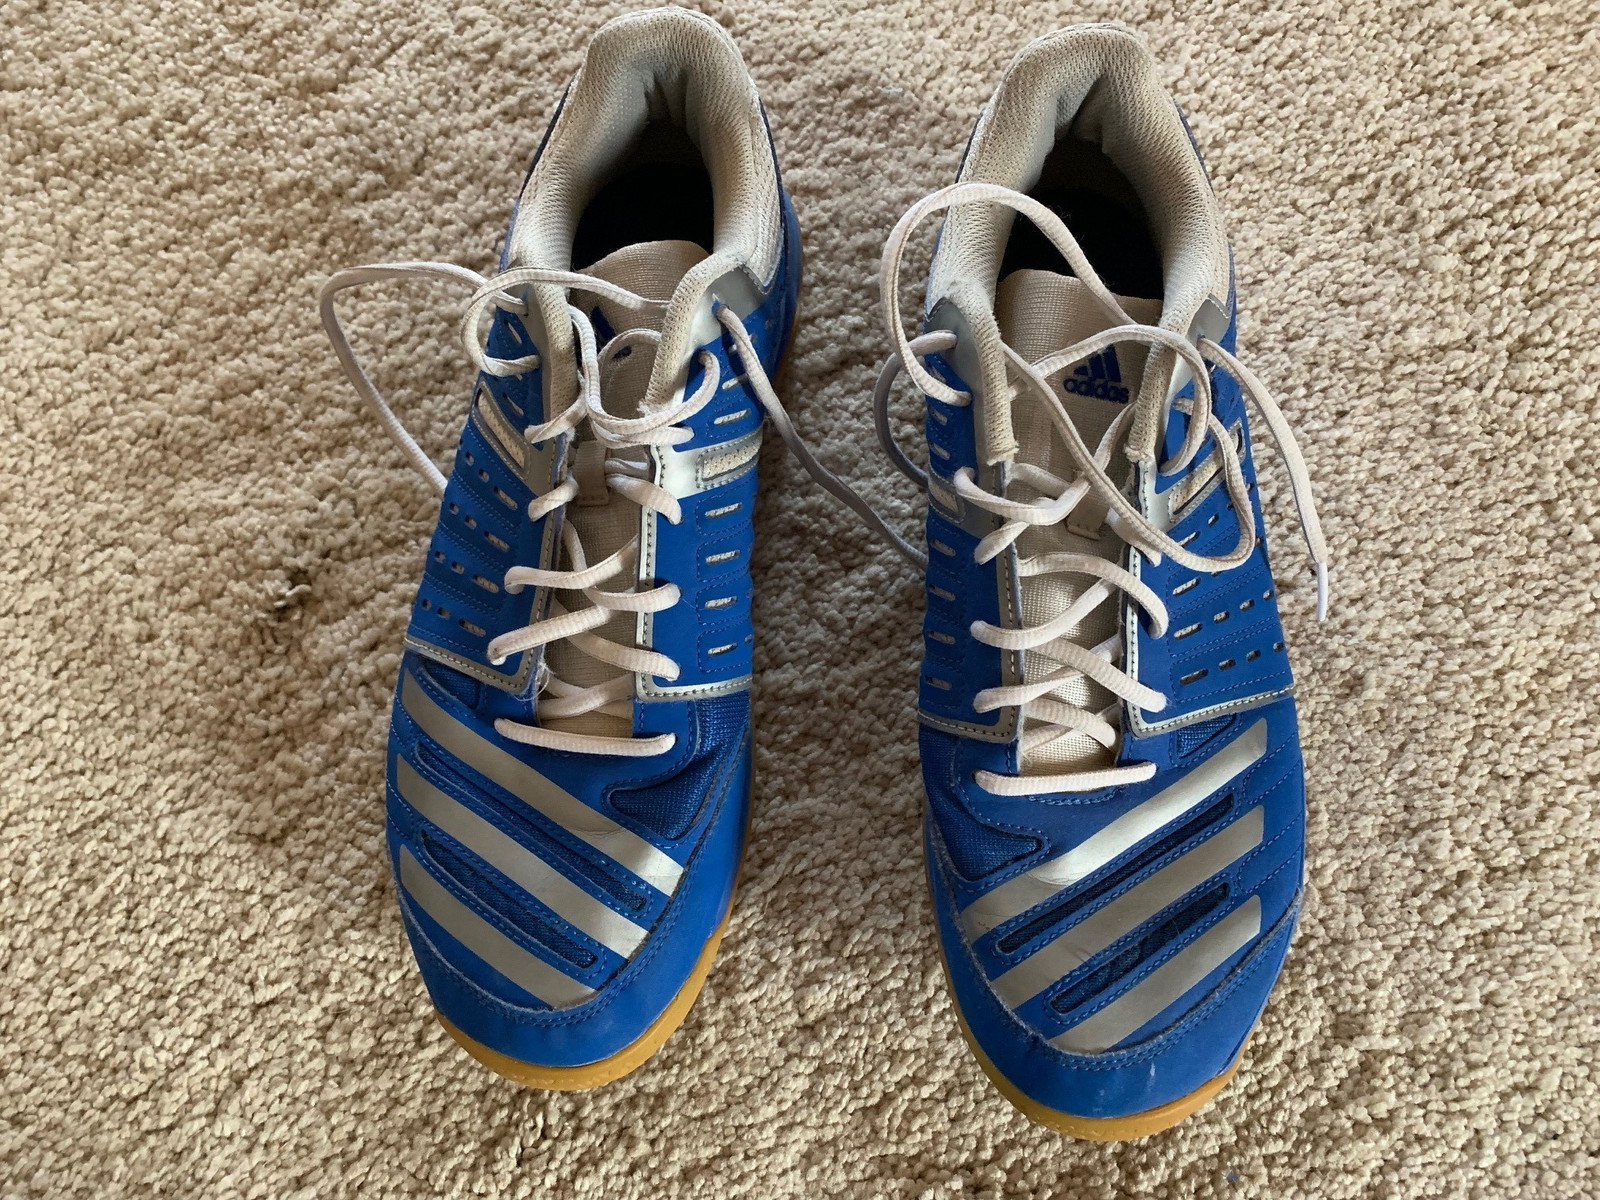 Adidas hallsko fritidssko str 46 selges rimelig | FINN.no